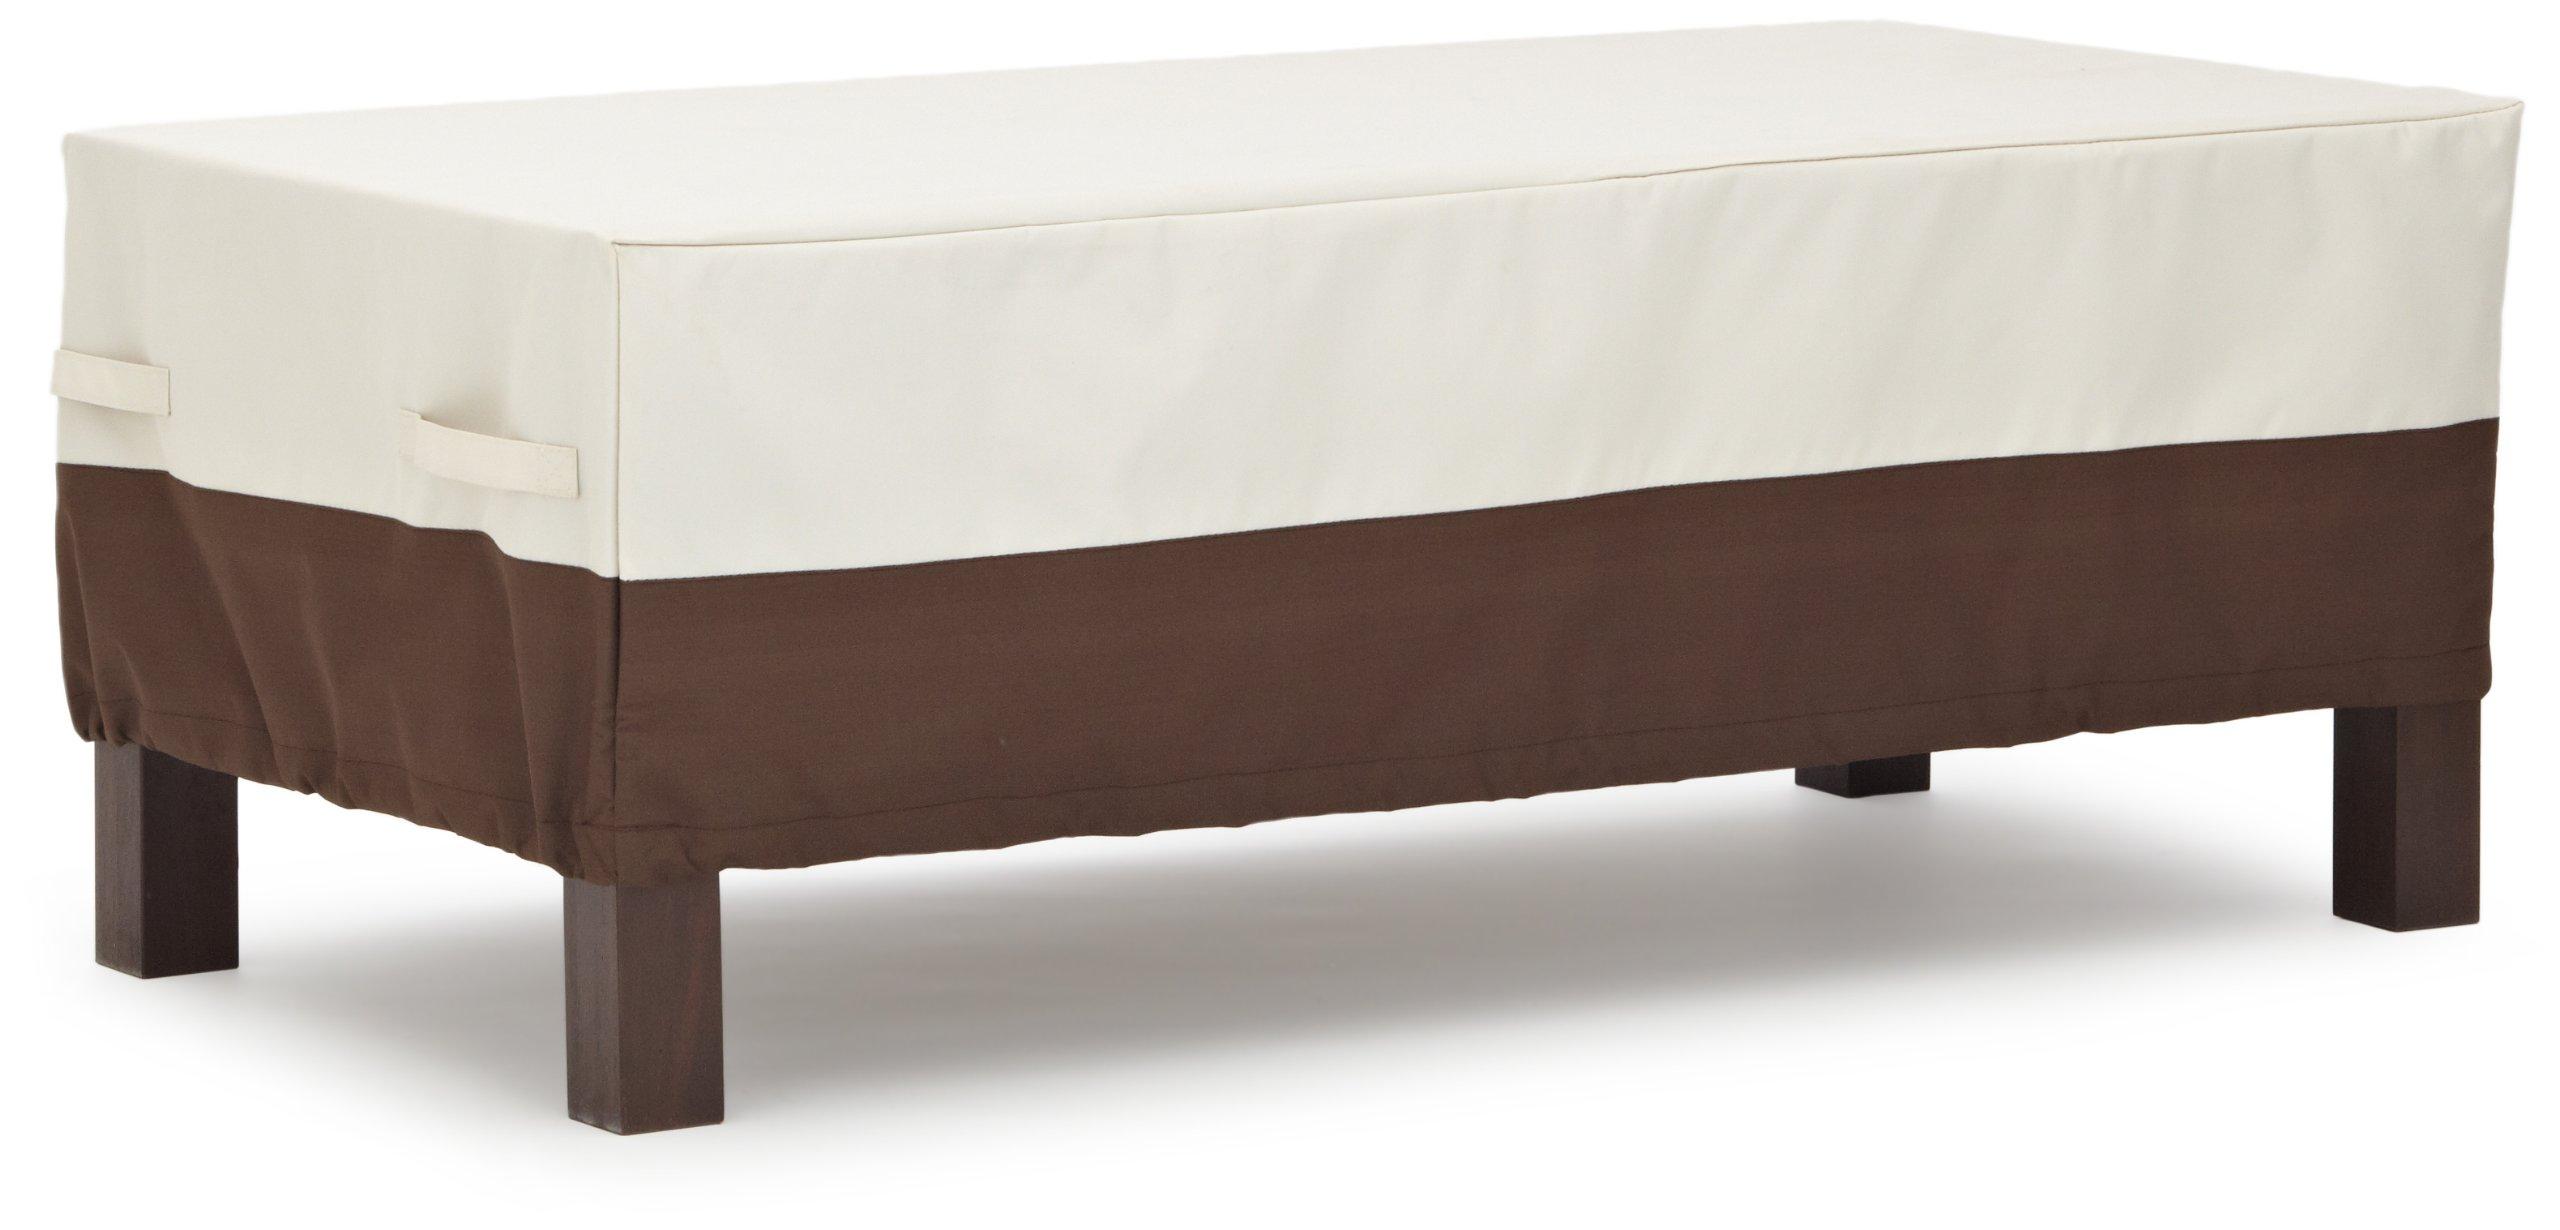 AmazonBasics Coffee Table Patio Cover